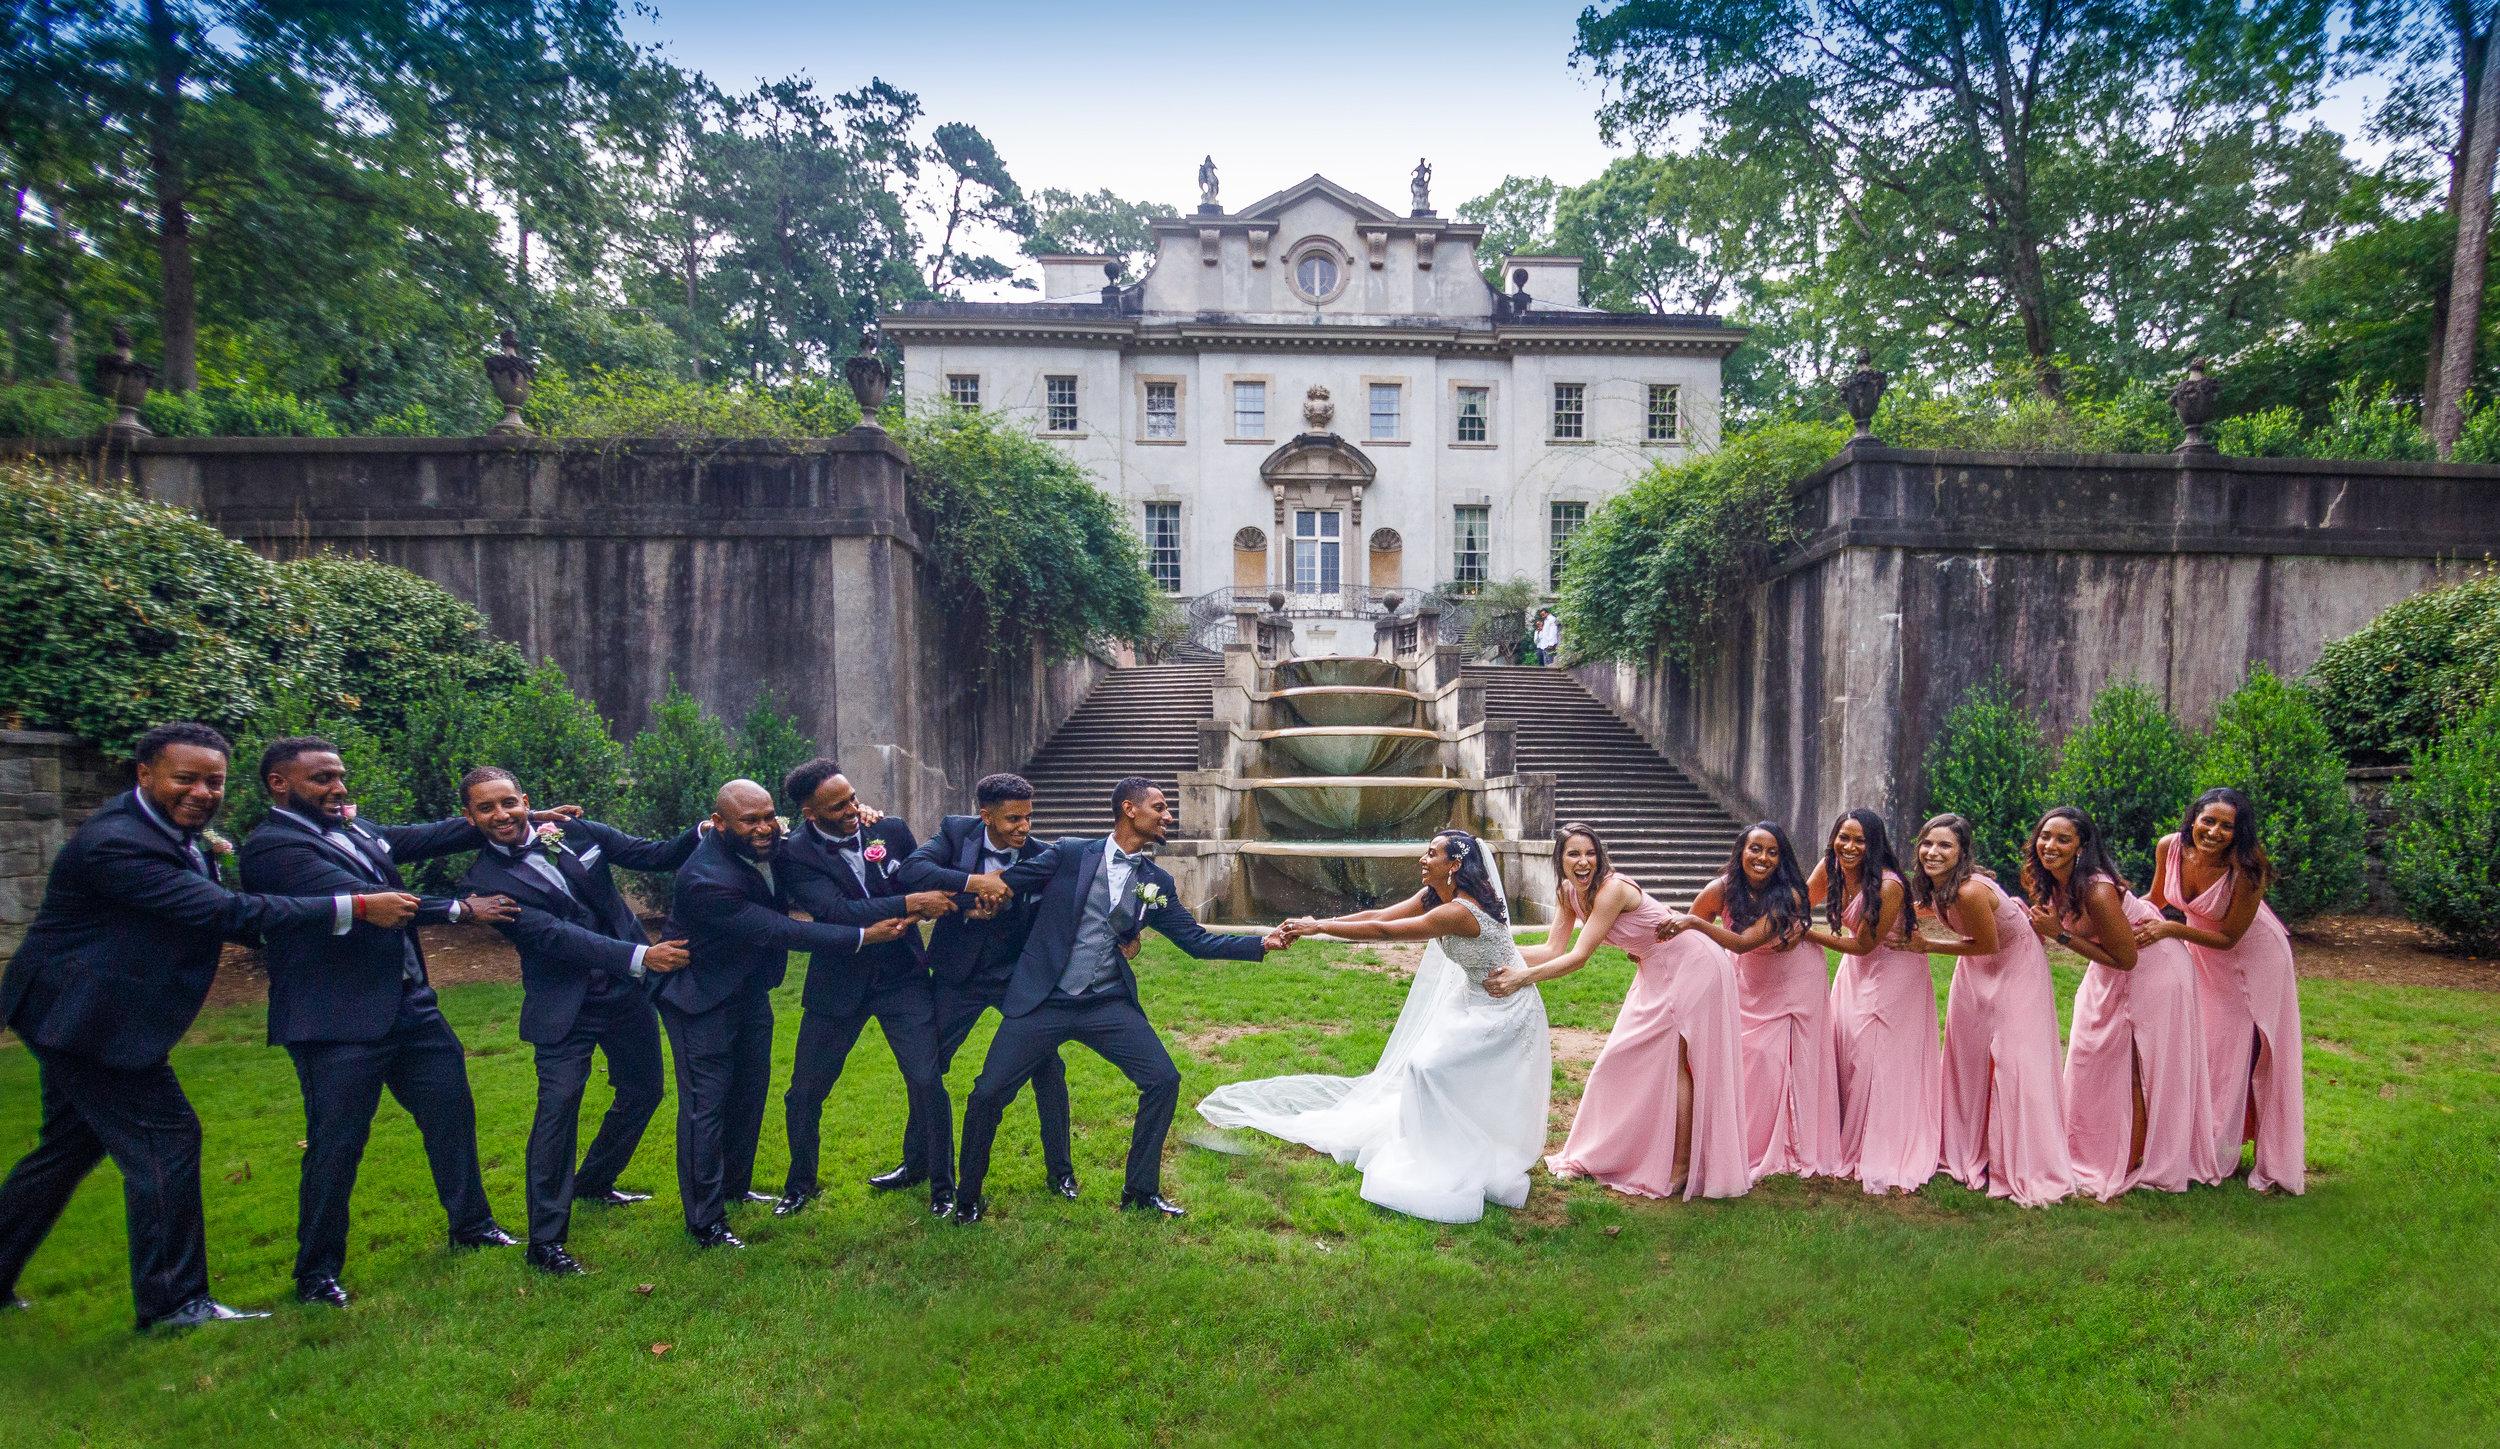 Swan House wedding photos by the Atlanta Wedding Photographers at AtlantaArtisticWeddings